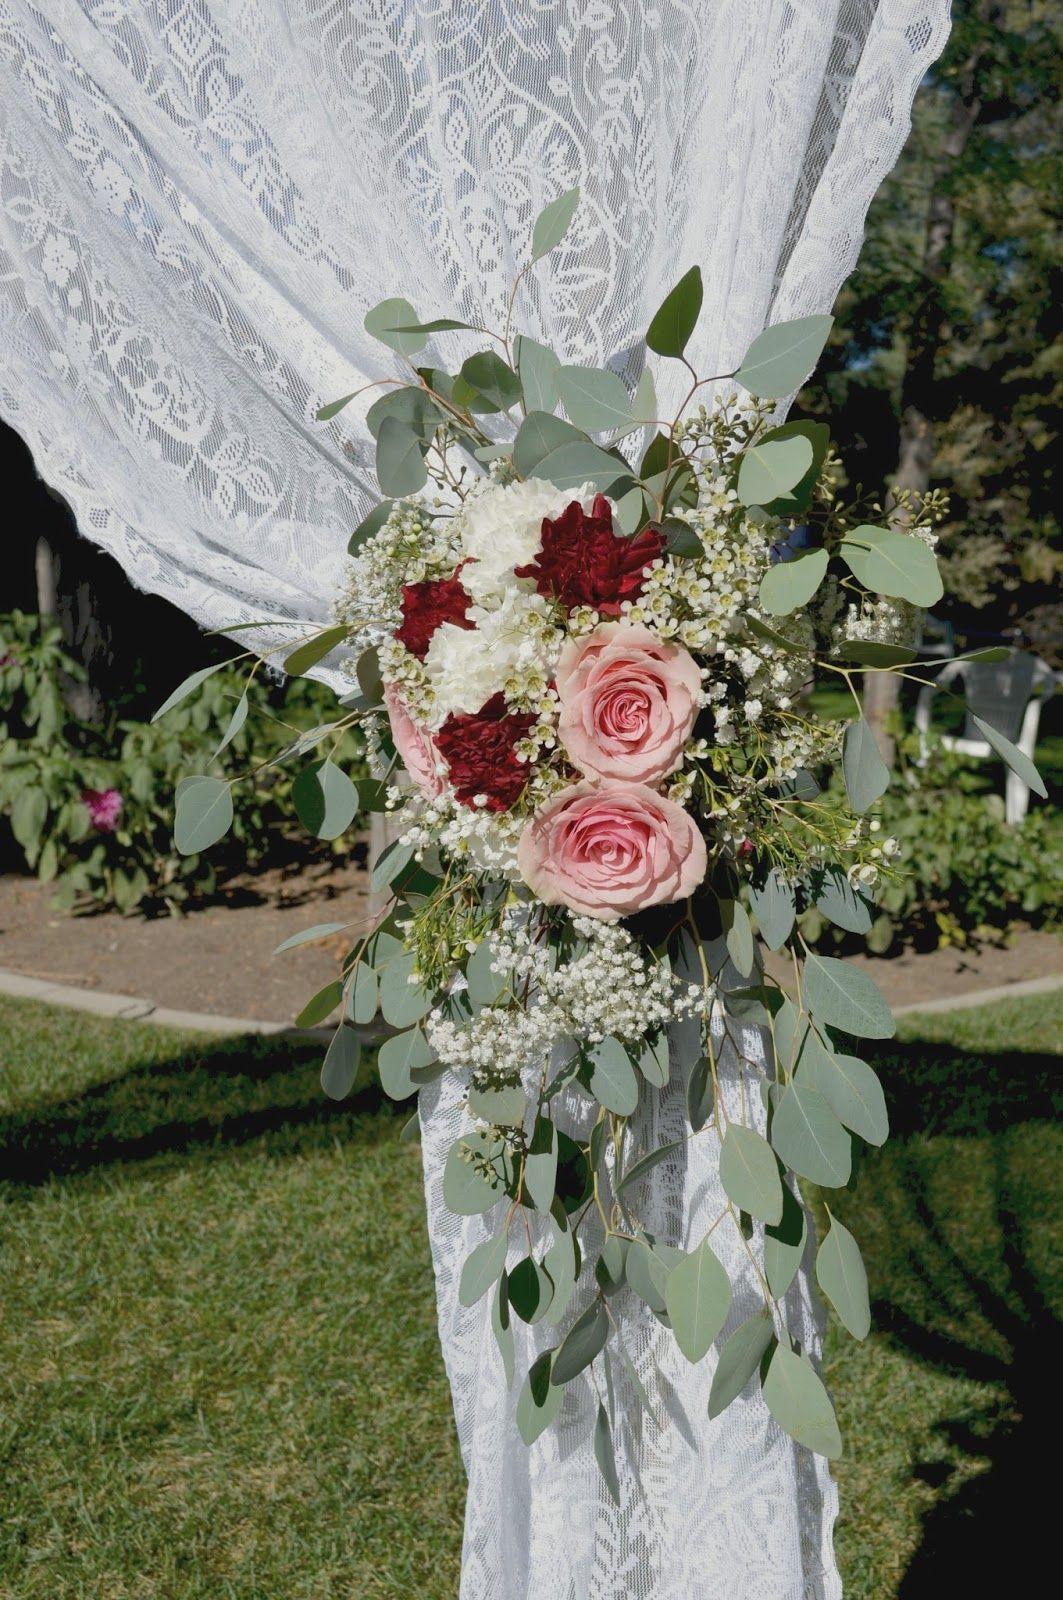 burgundy carnation, baby's breath and eucalyptus